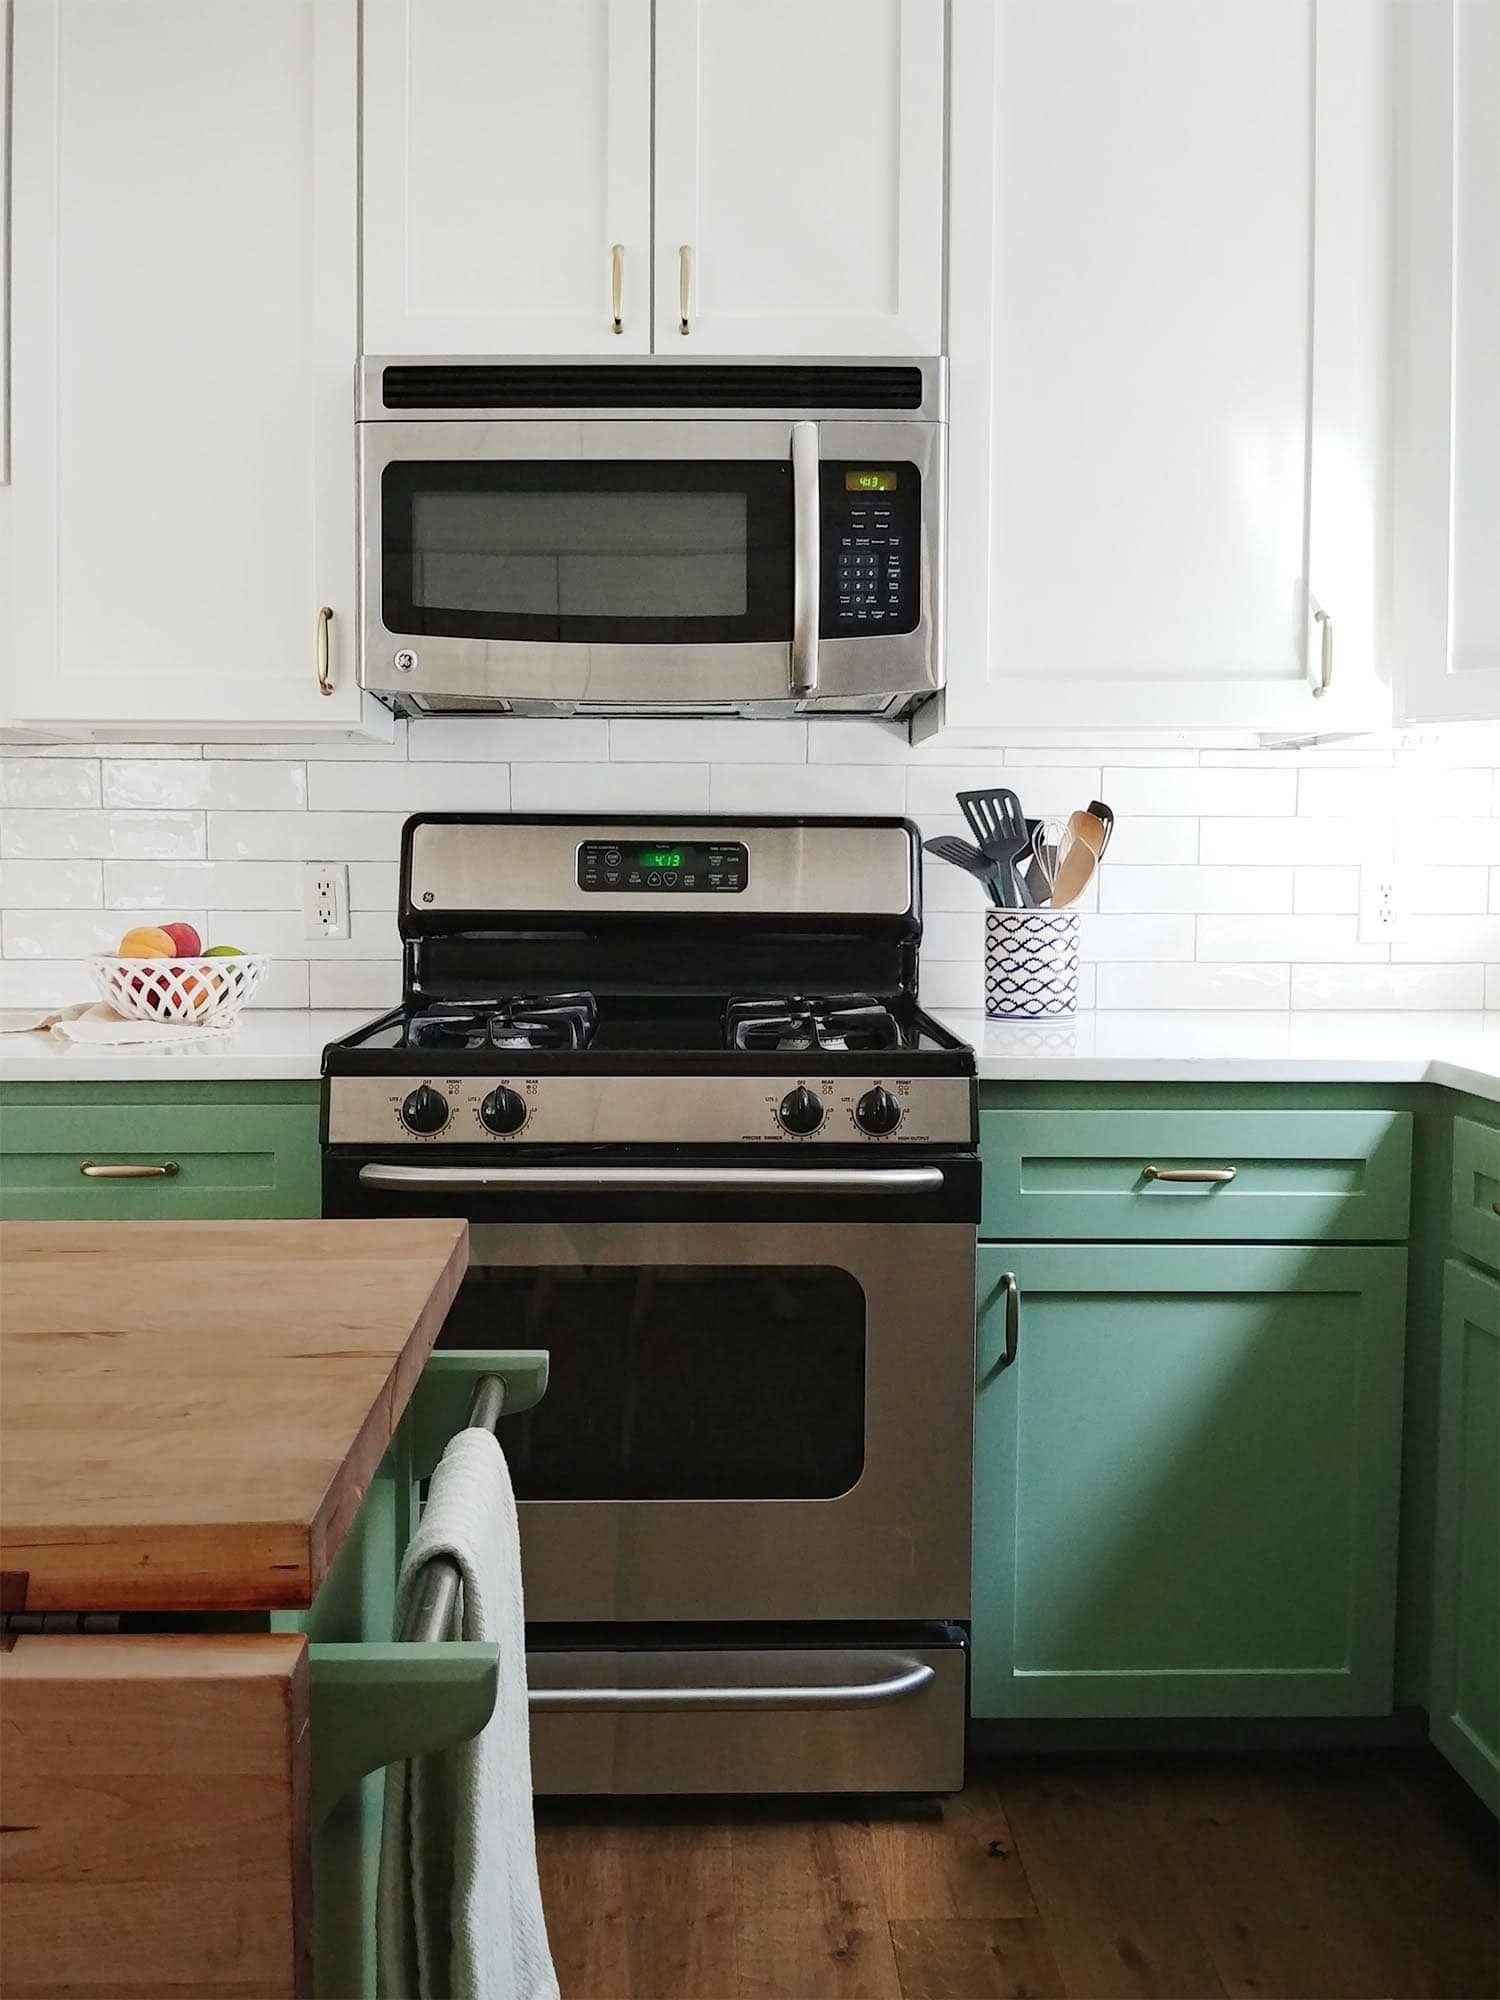 Kitchen Cabinets In Bm 445 Greenwich Village And Sw 7008 Alabaster Painting Cabinets Painting Kitchen Cabinets Shaker Kitchen Cabinets